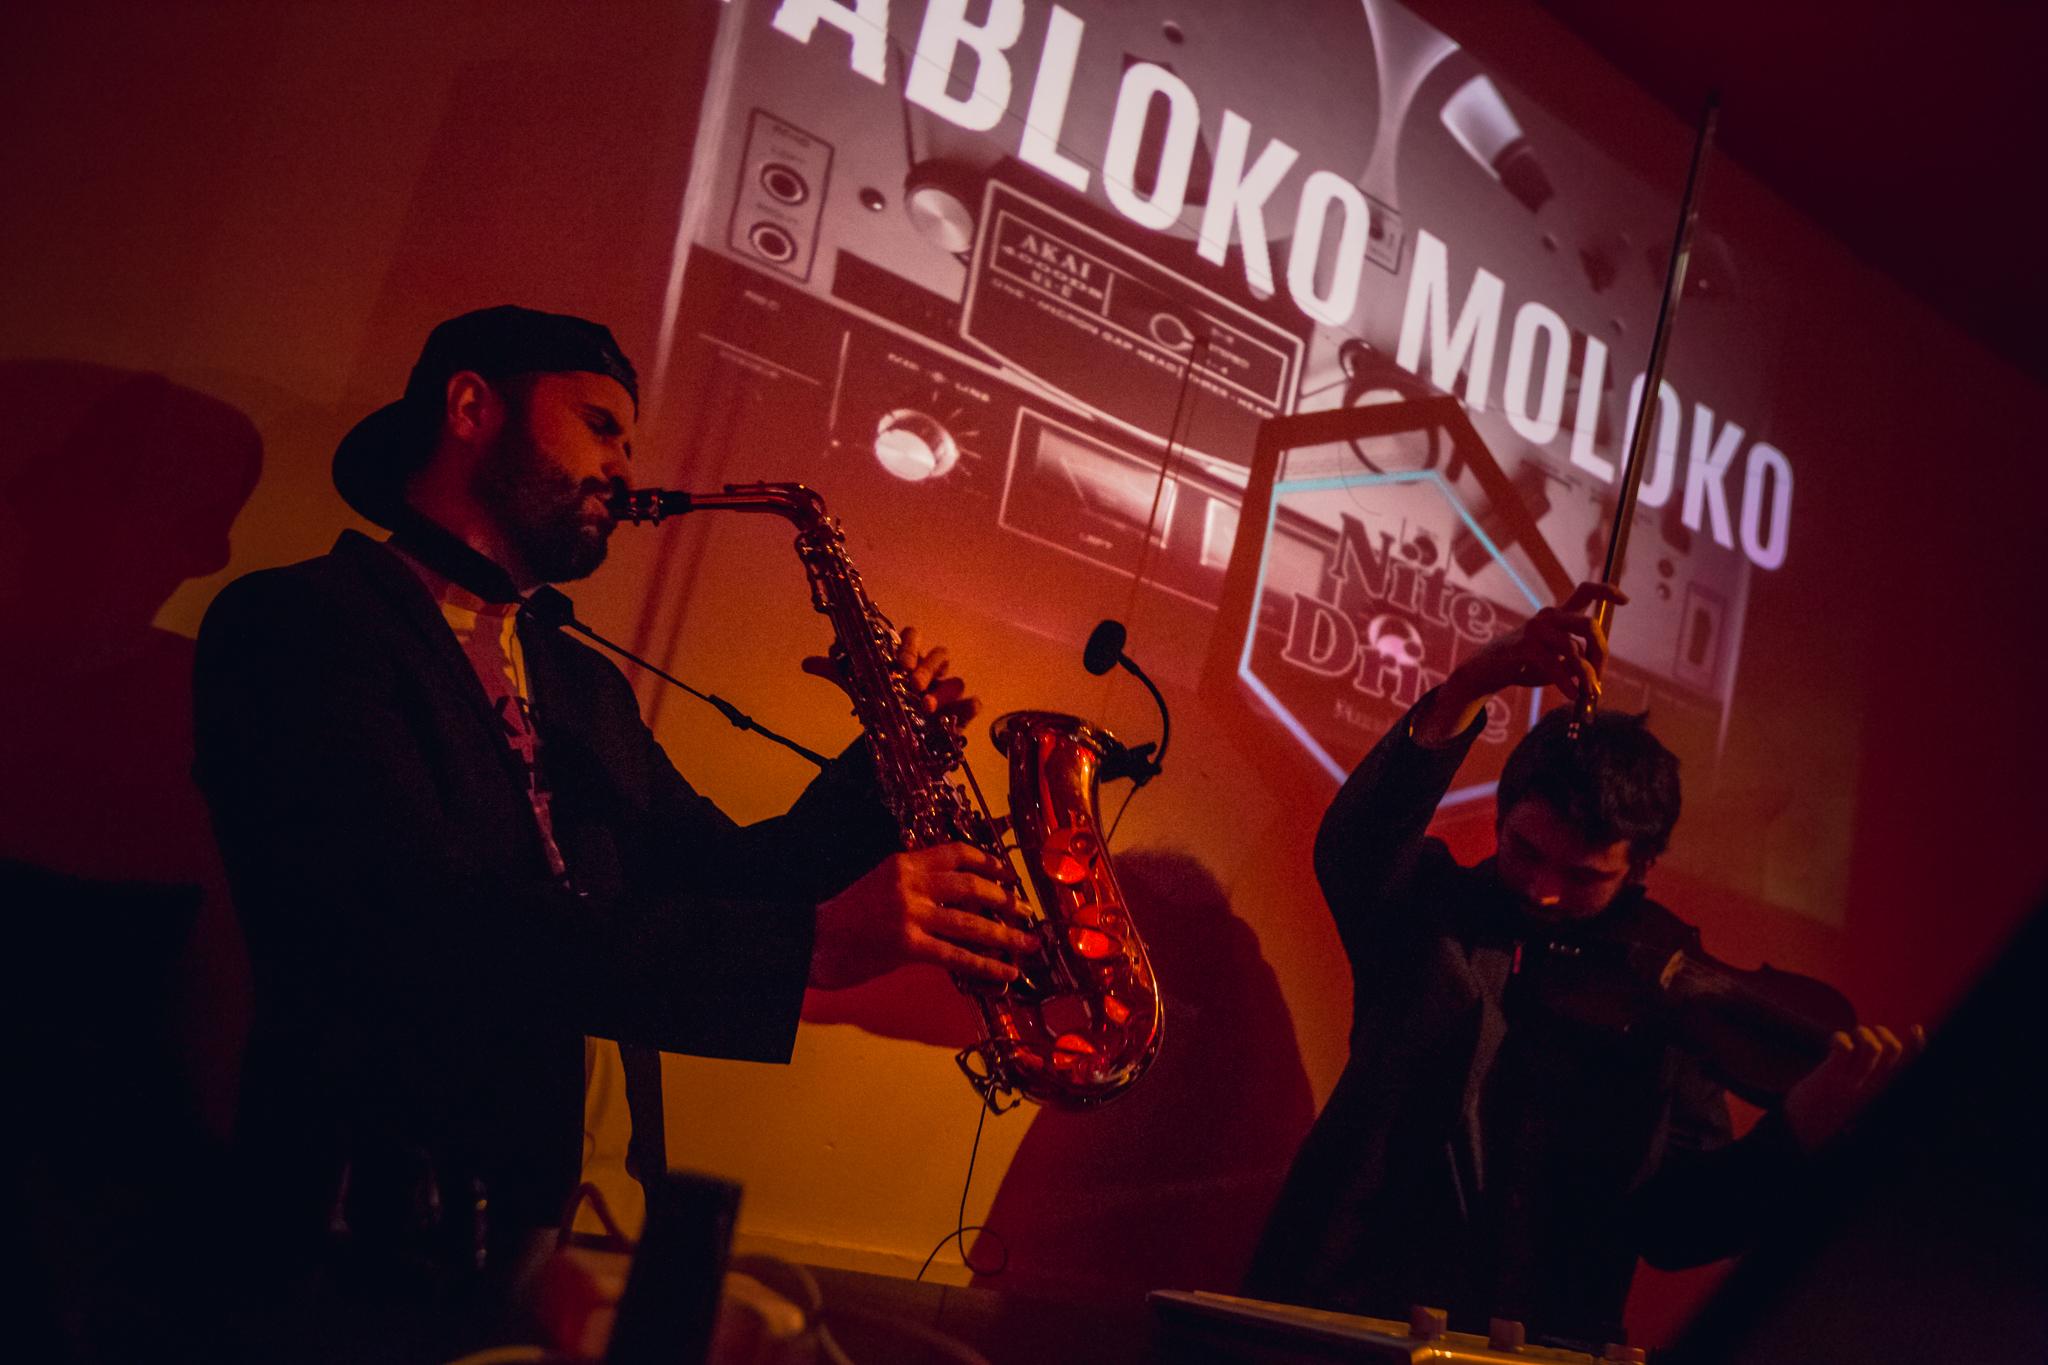 Yabloko Moloko Electro Swing DJ + Saxofon in Barcelona